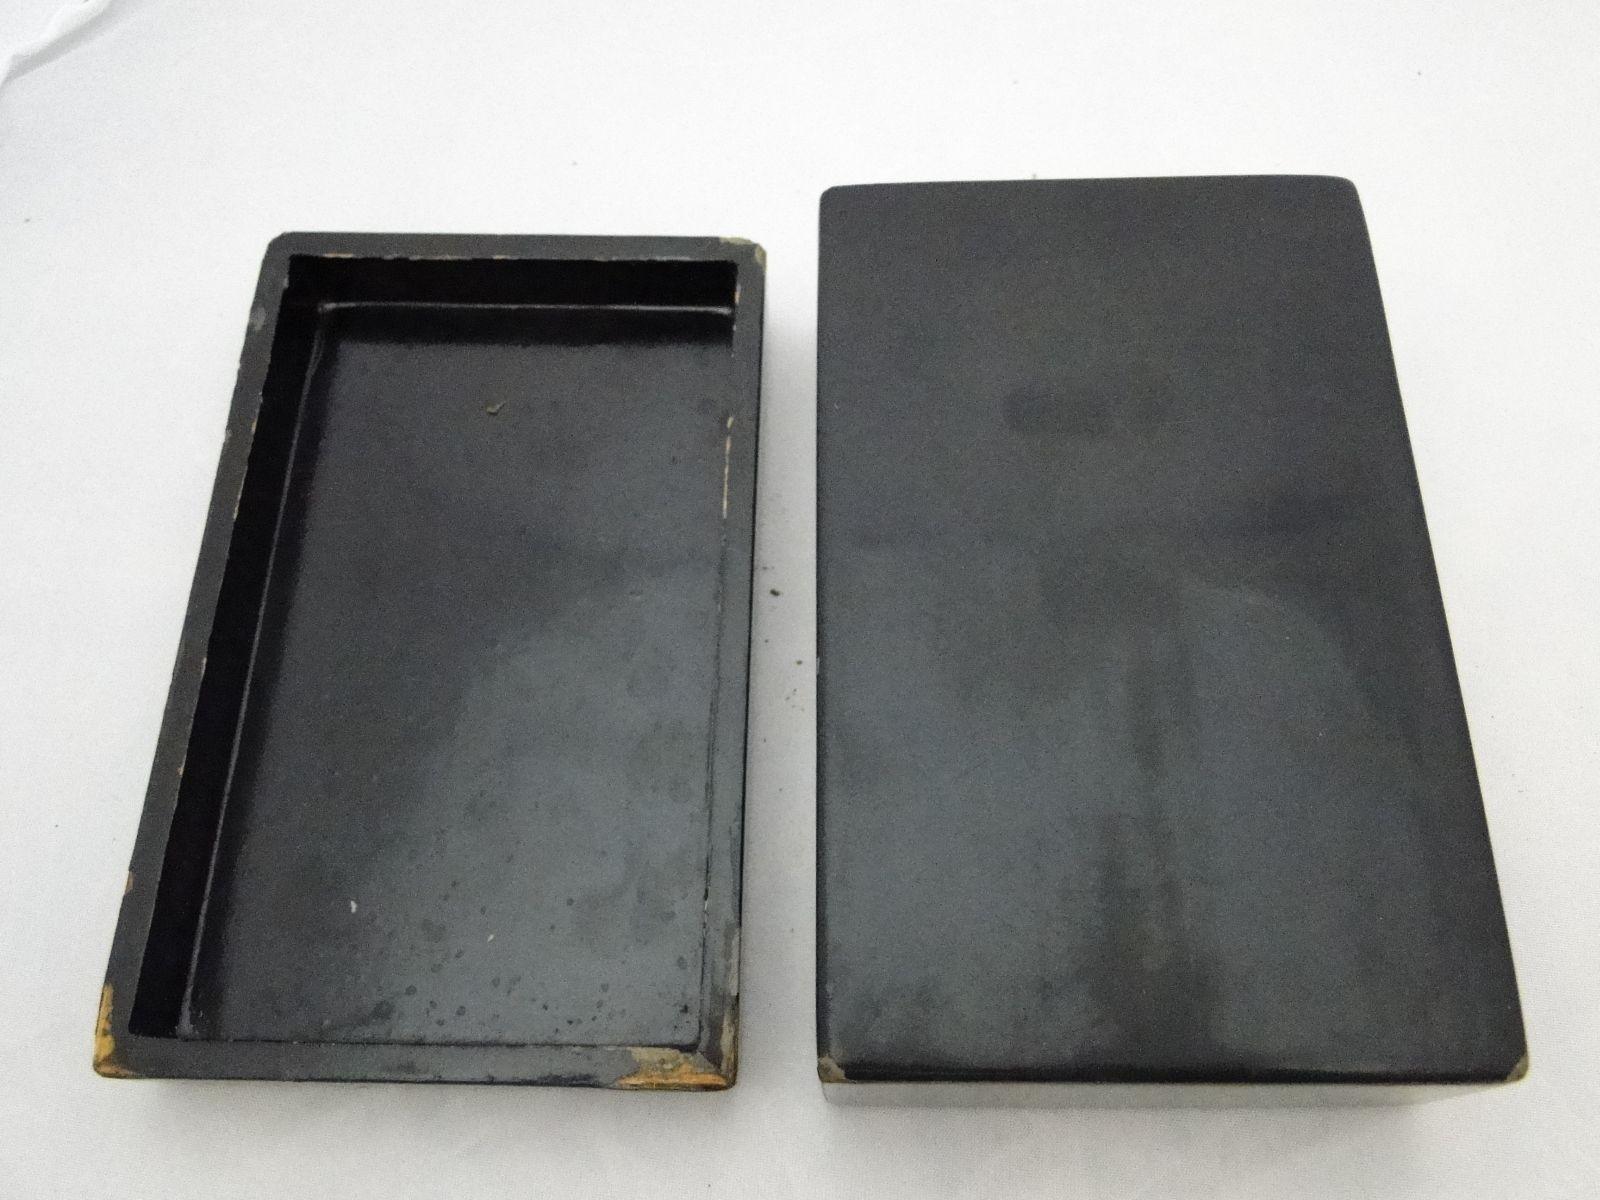 DSC02910.JPG (1600×1200)